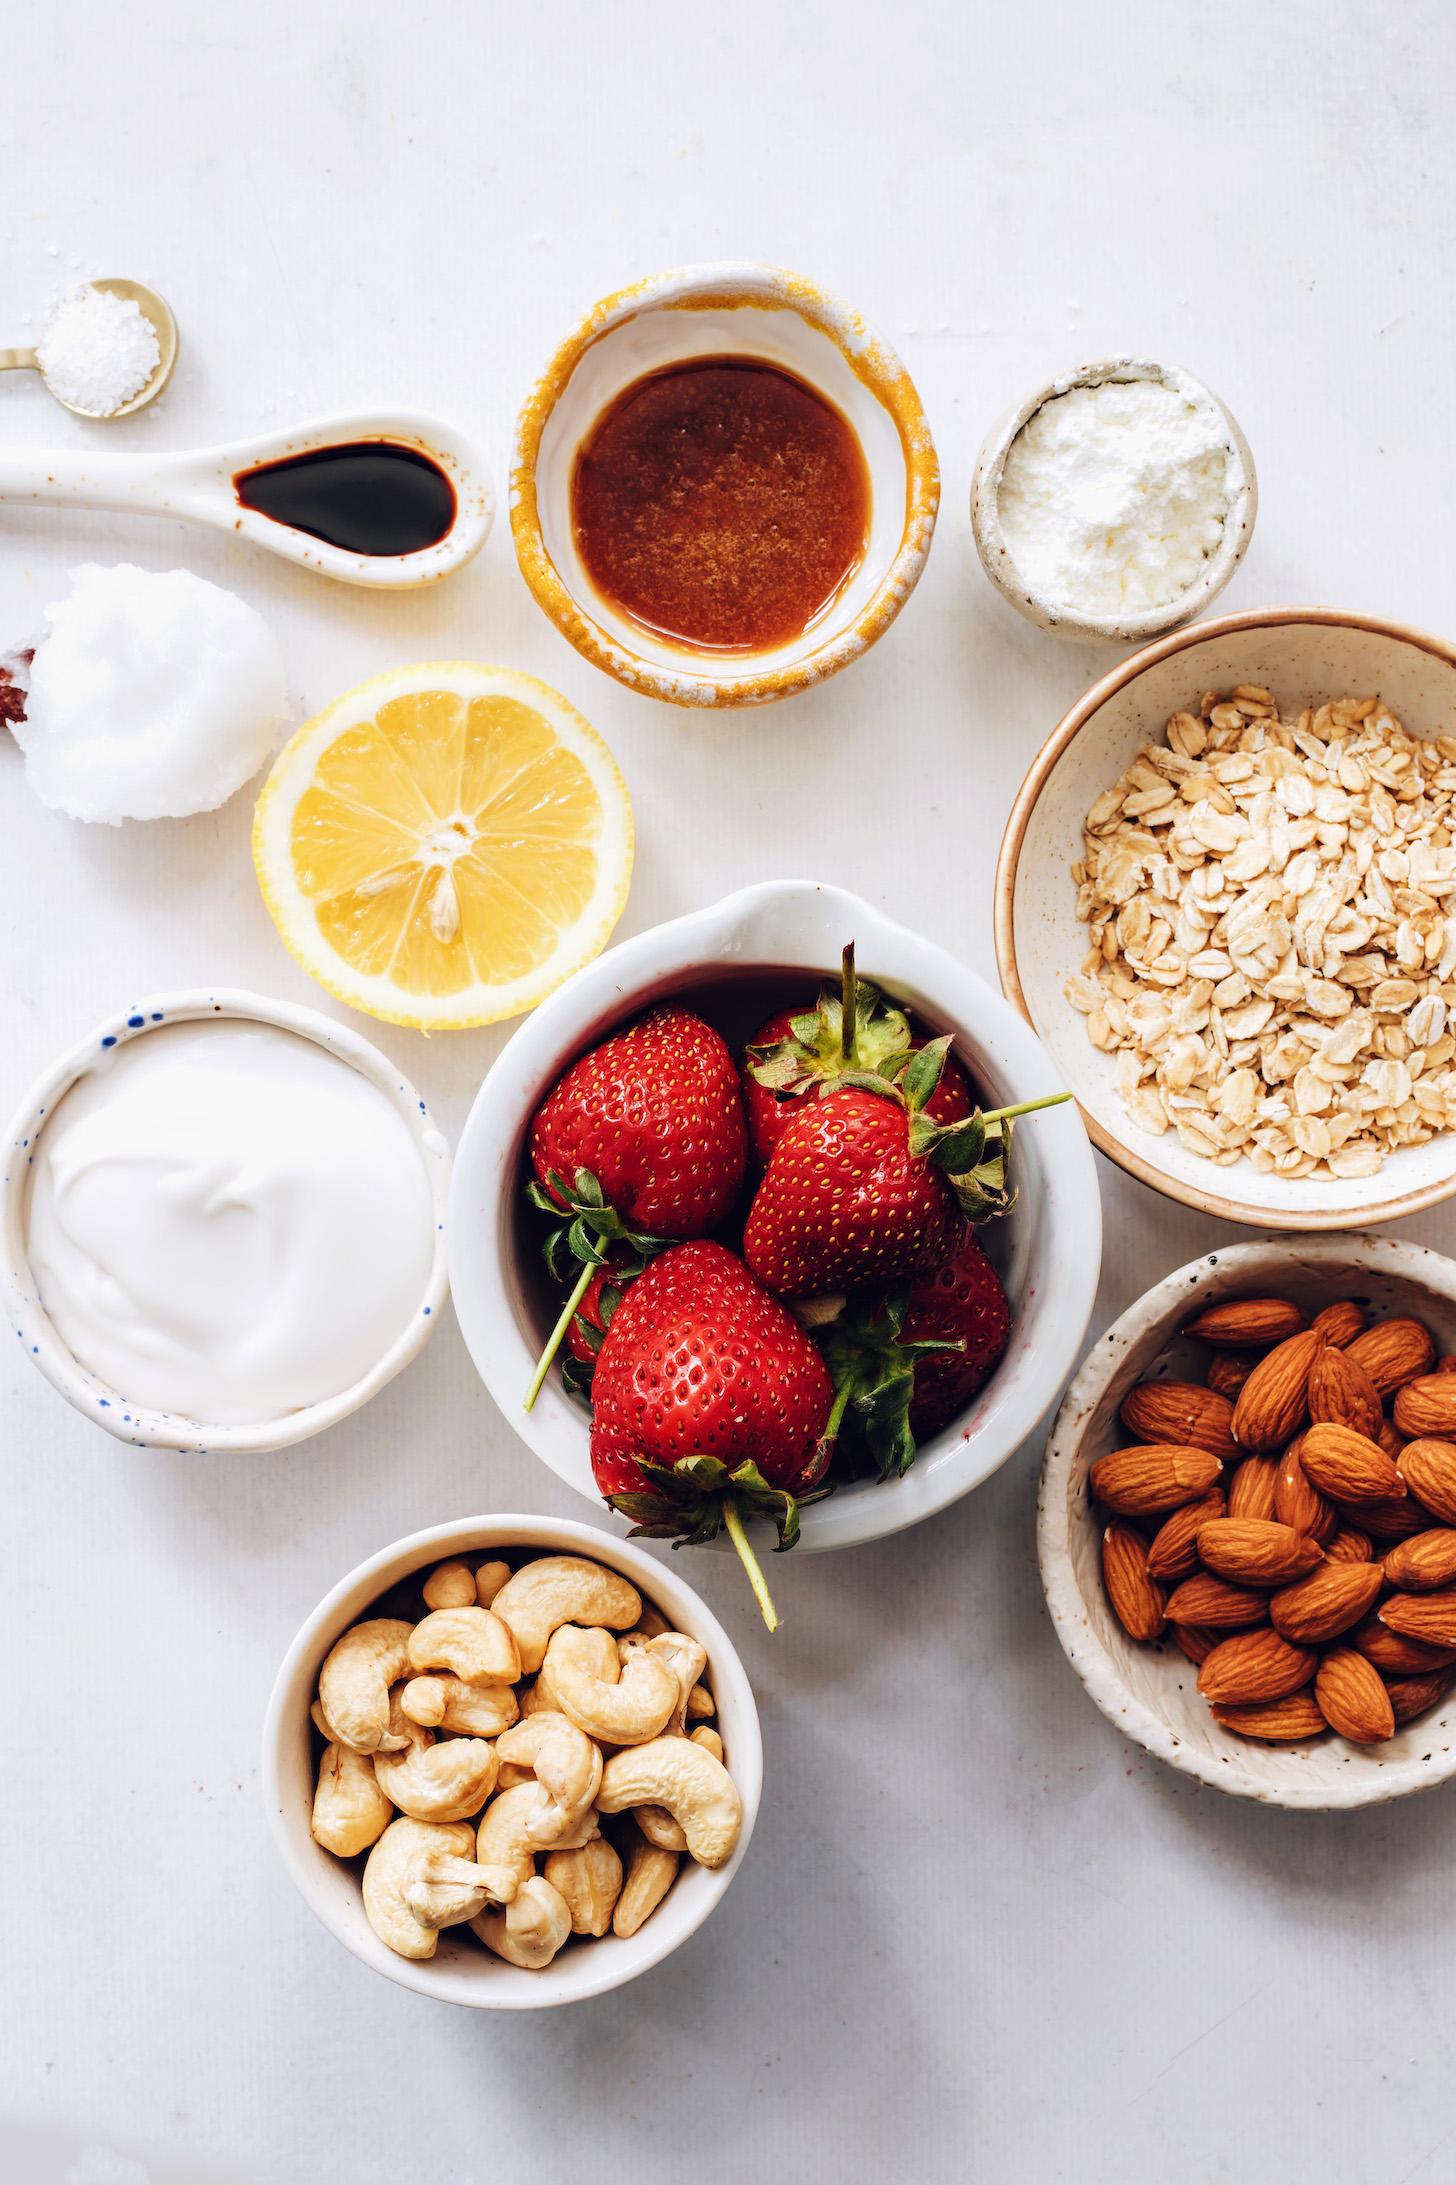 Cashews, almonds, oats, strawberries, coconut cream, lemon, cornstarch, maple syrup, vanilla, coconut oil, and salt